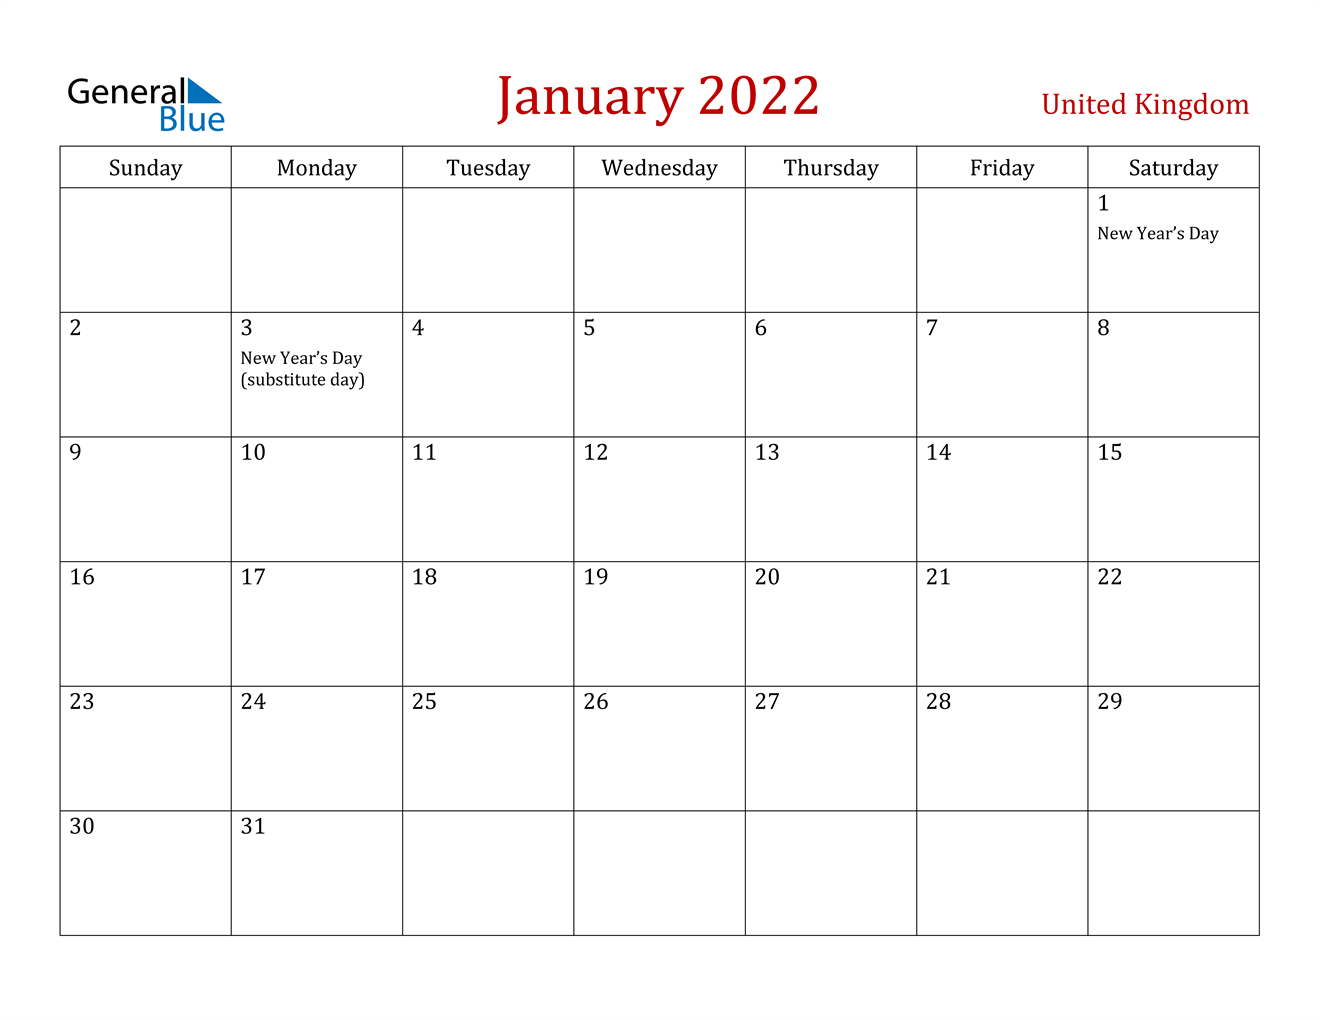 January 2022 Calendar - United Kingdom Regarding 2022 January Blank Calendar